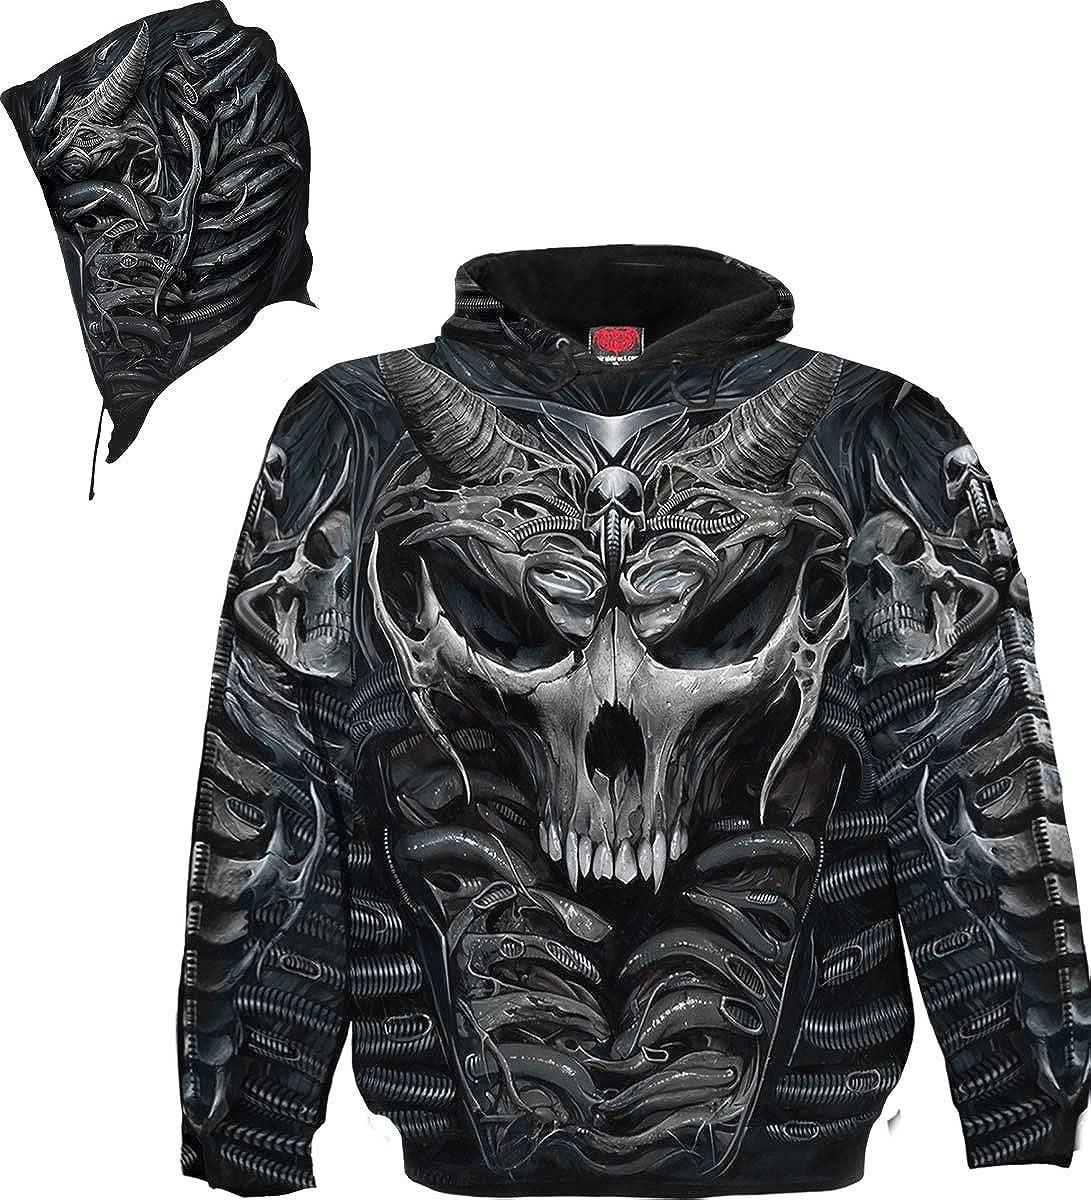 Allover Hoody Black Skull Armour Spiral